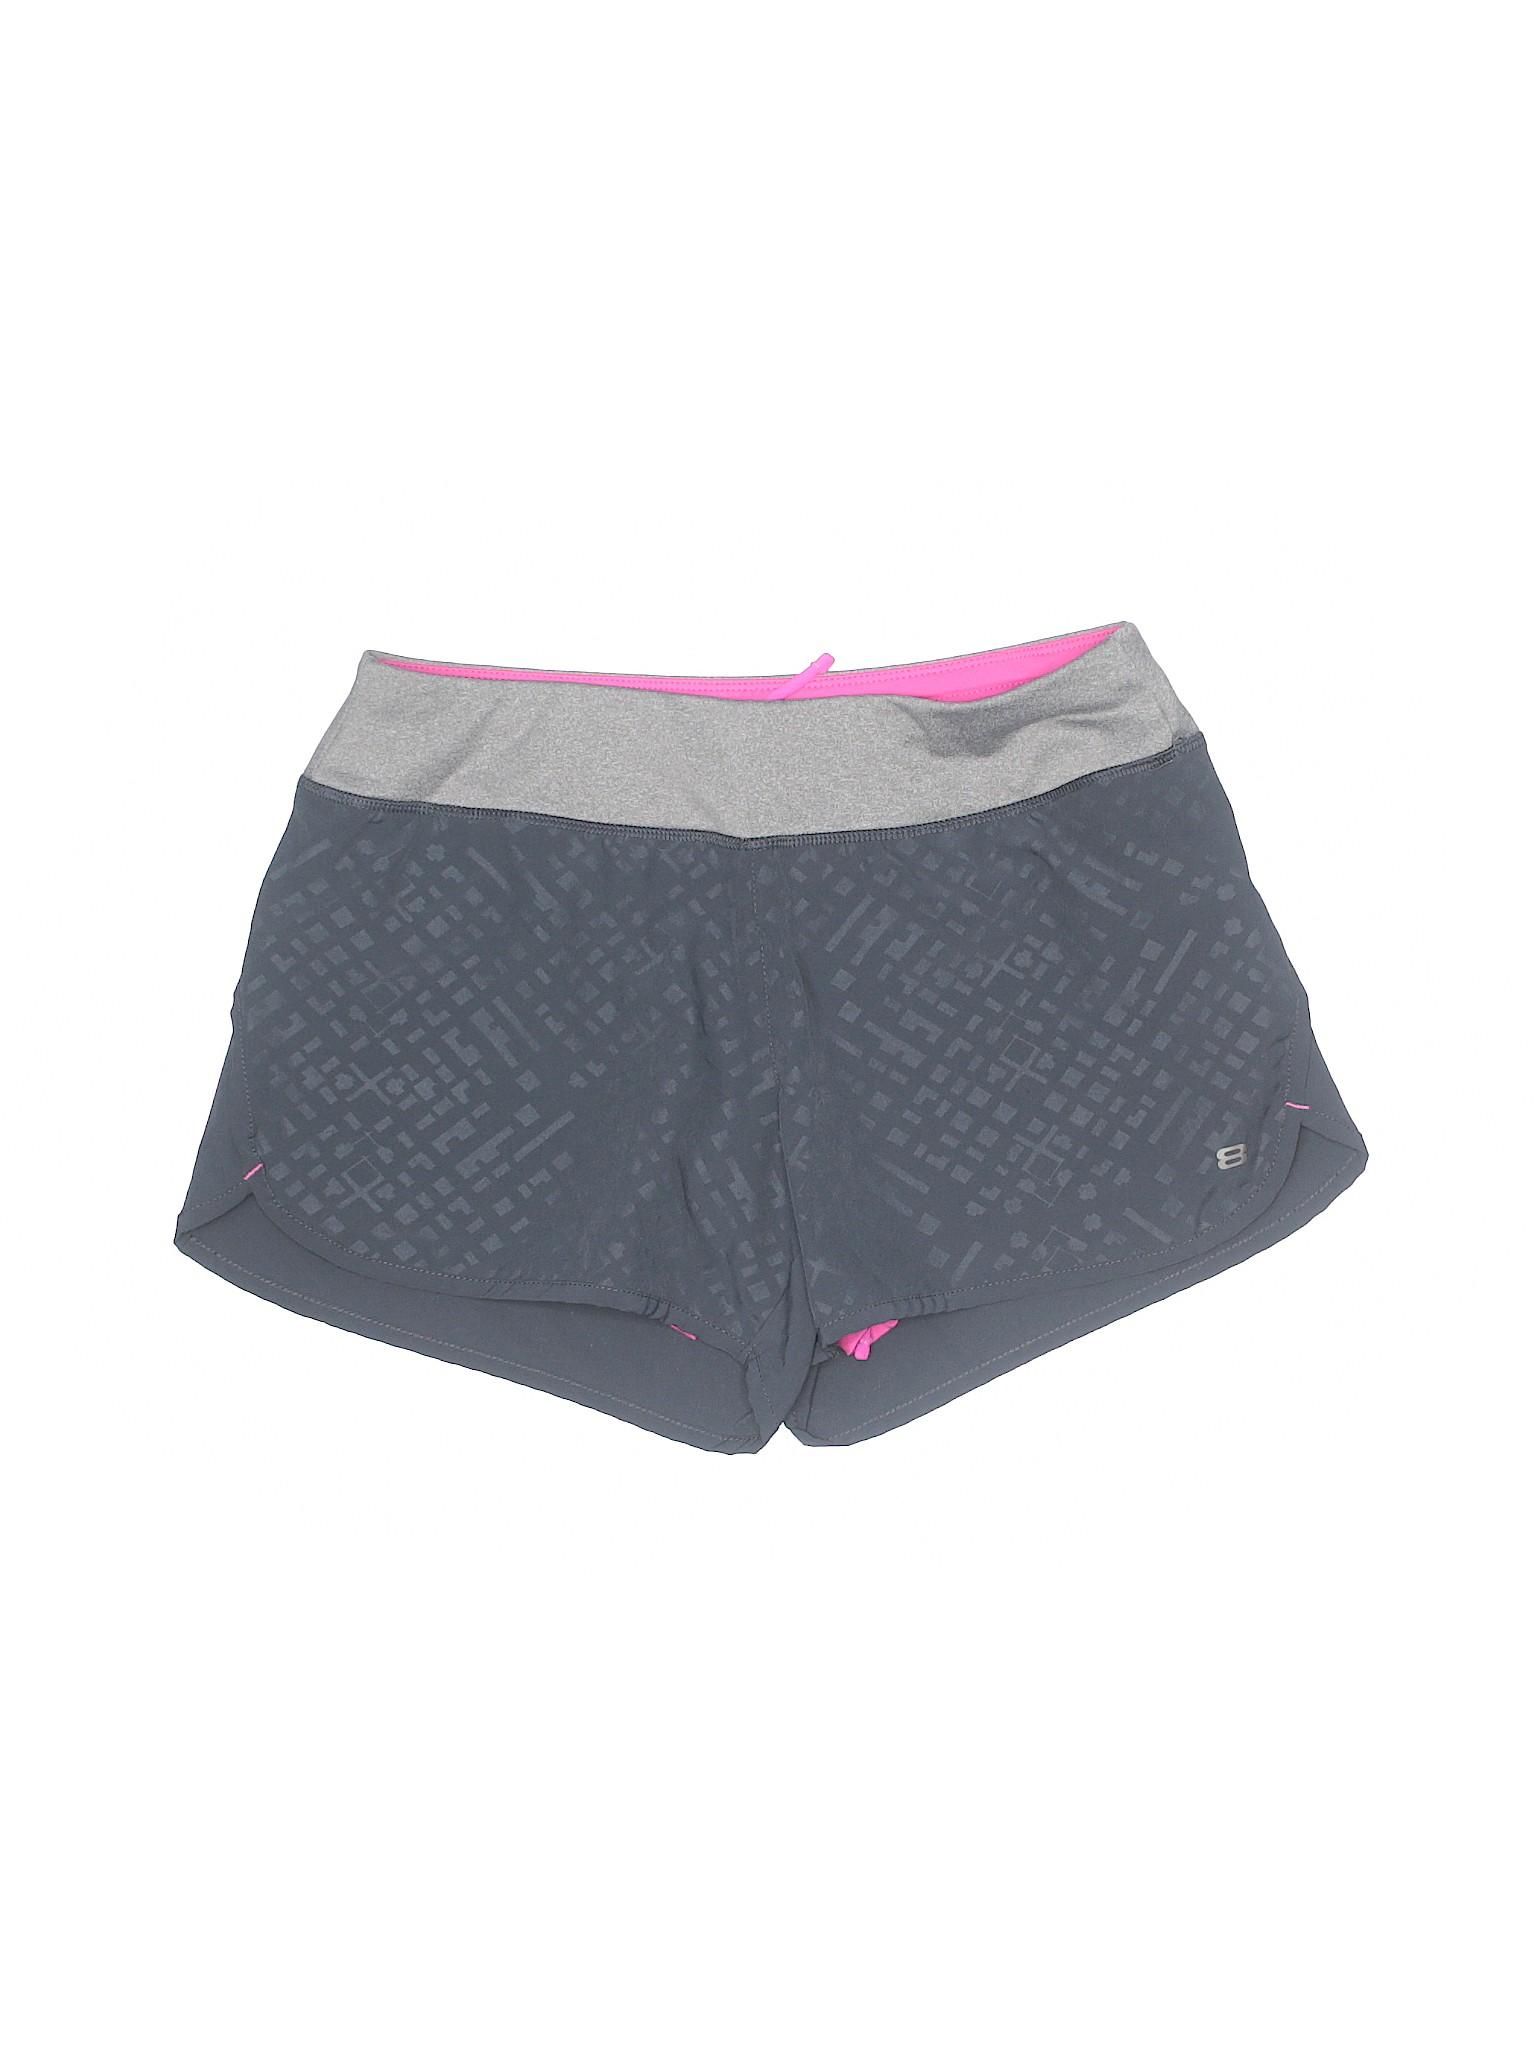 leisure Athletic Shorts Boutique 8 Layer fq8wnx0dx